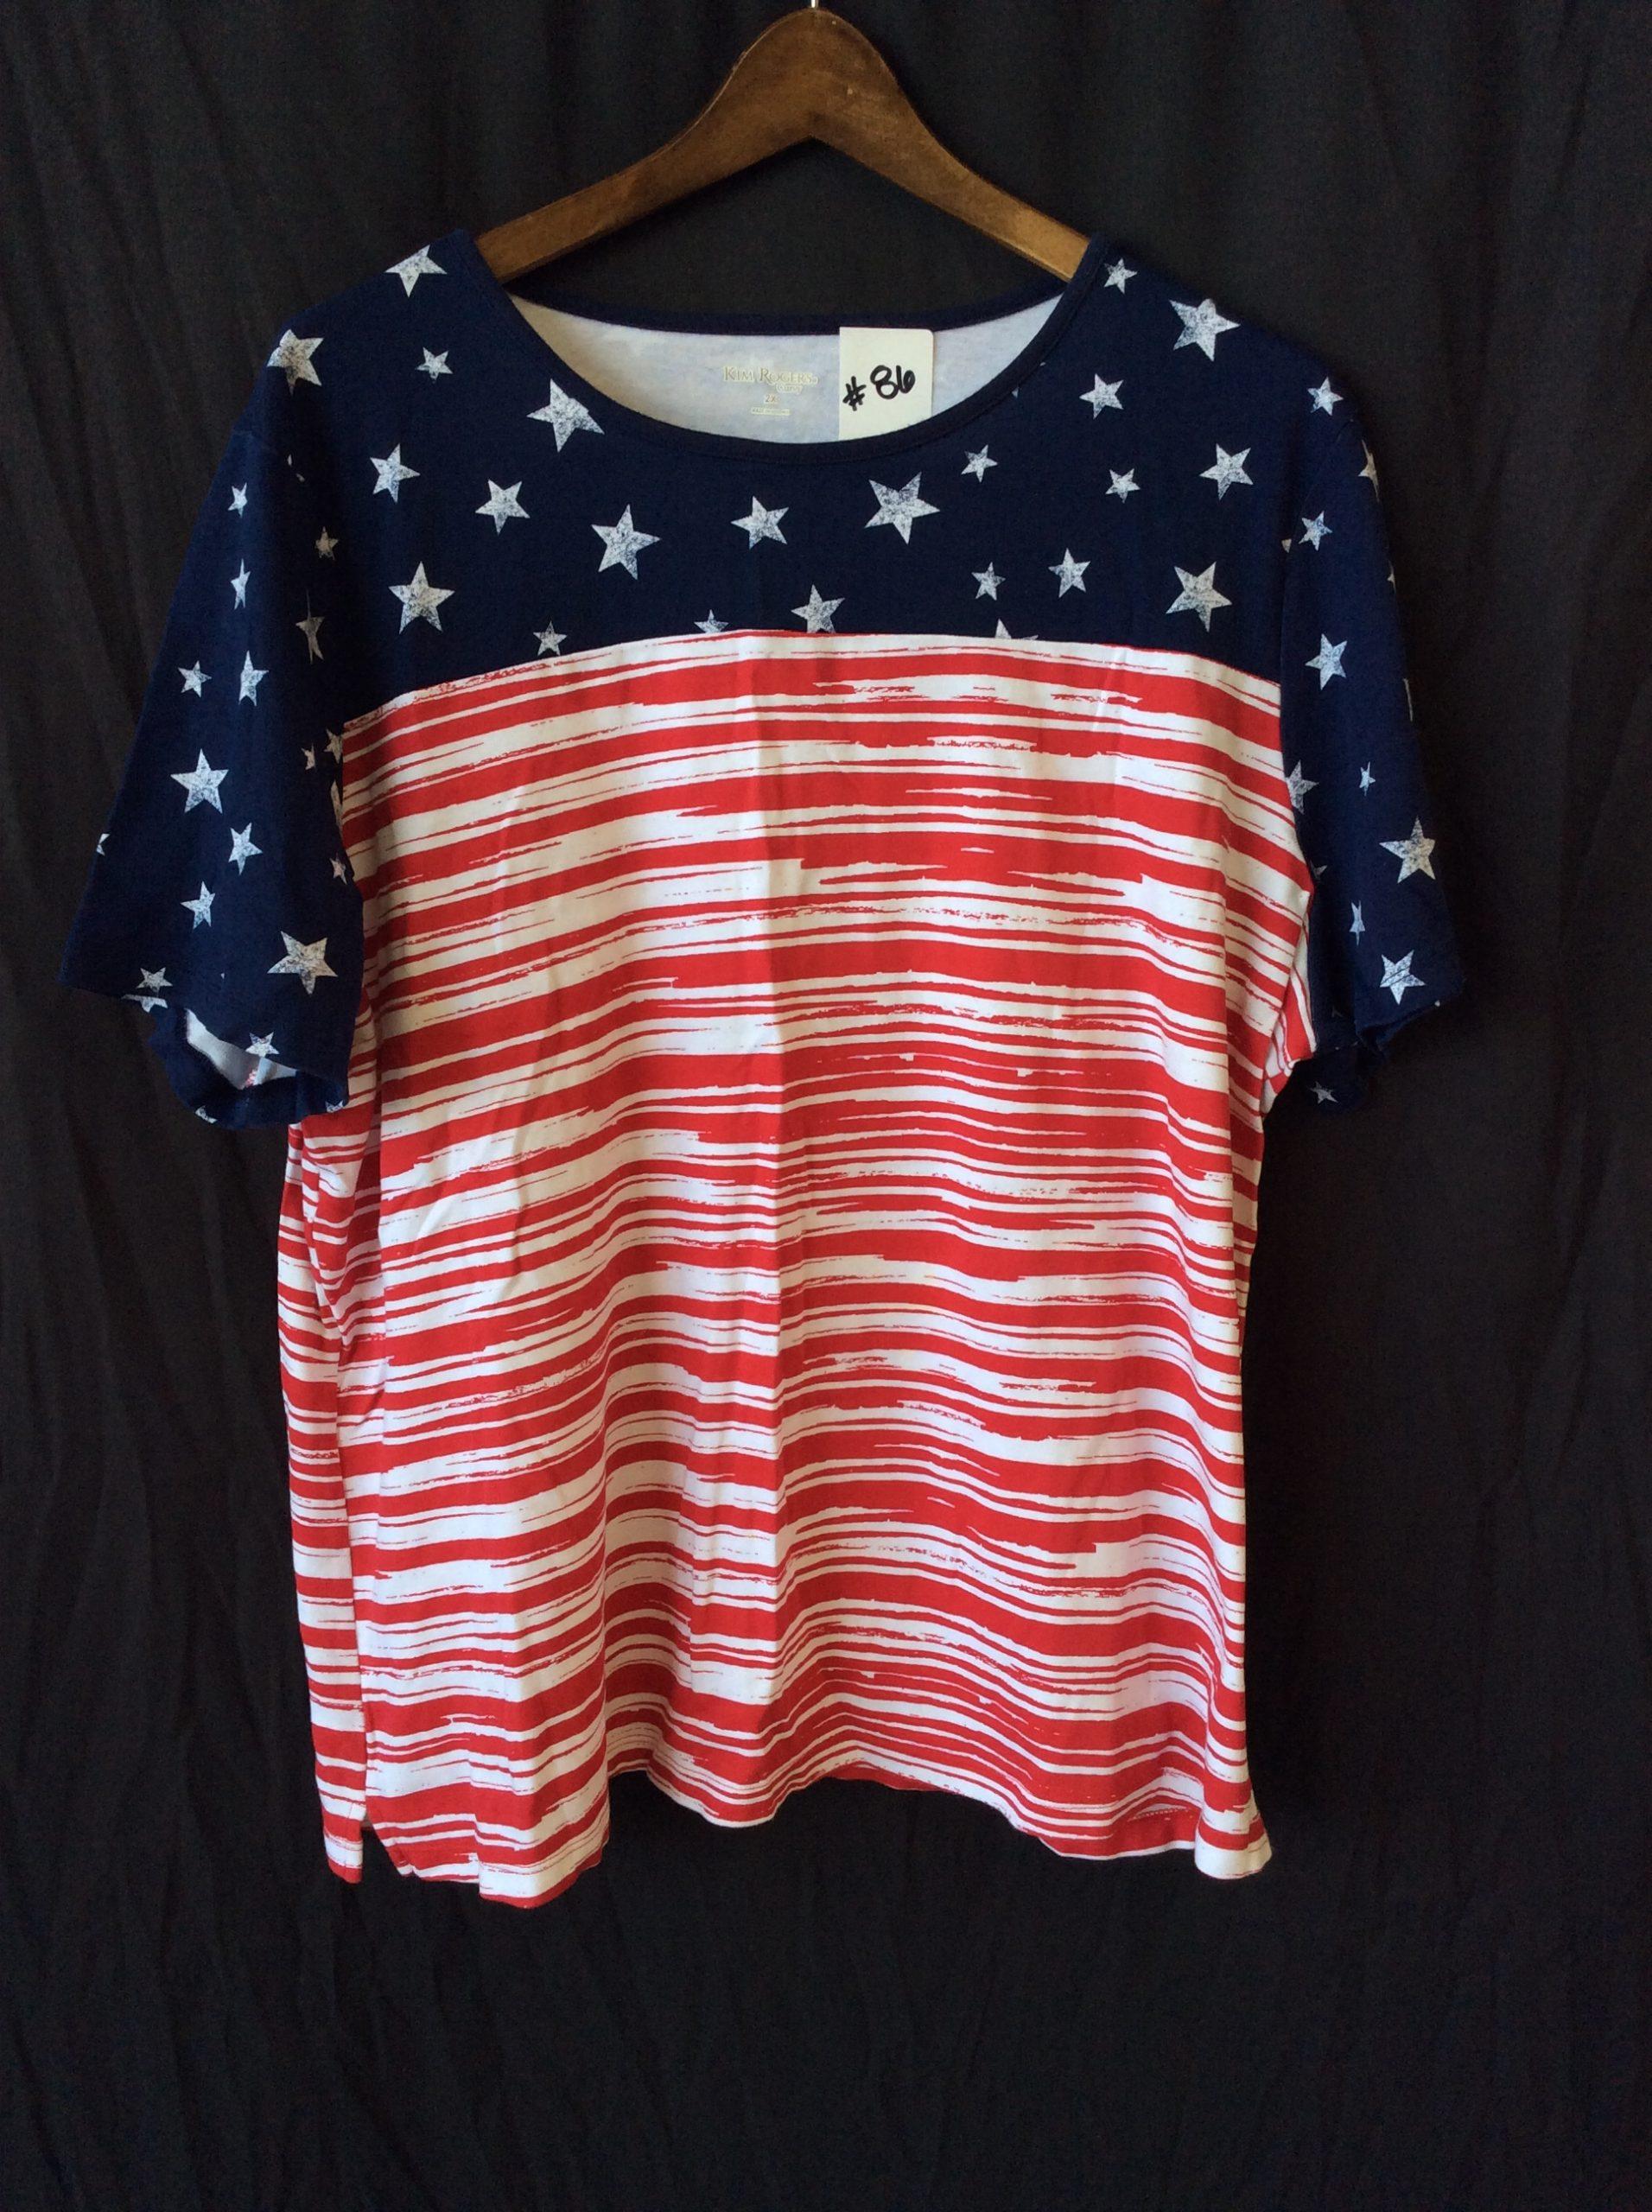 Women's stars and stripes tee, size xxl